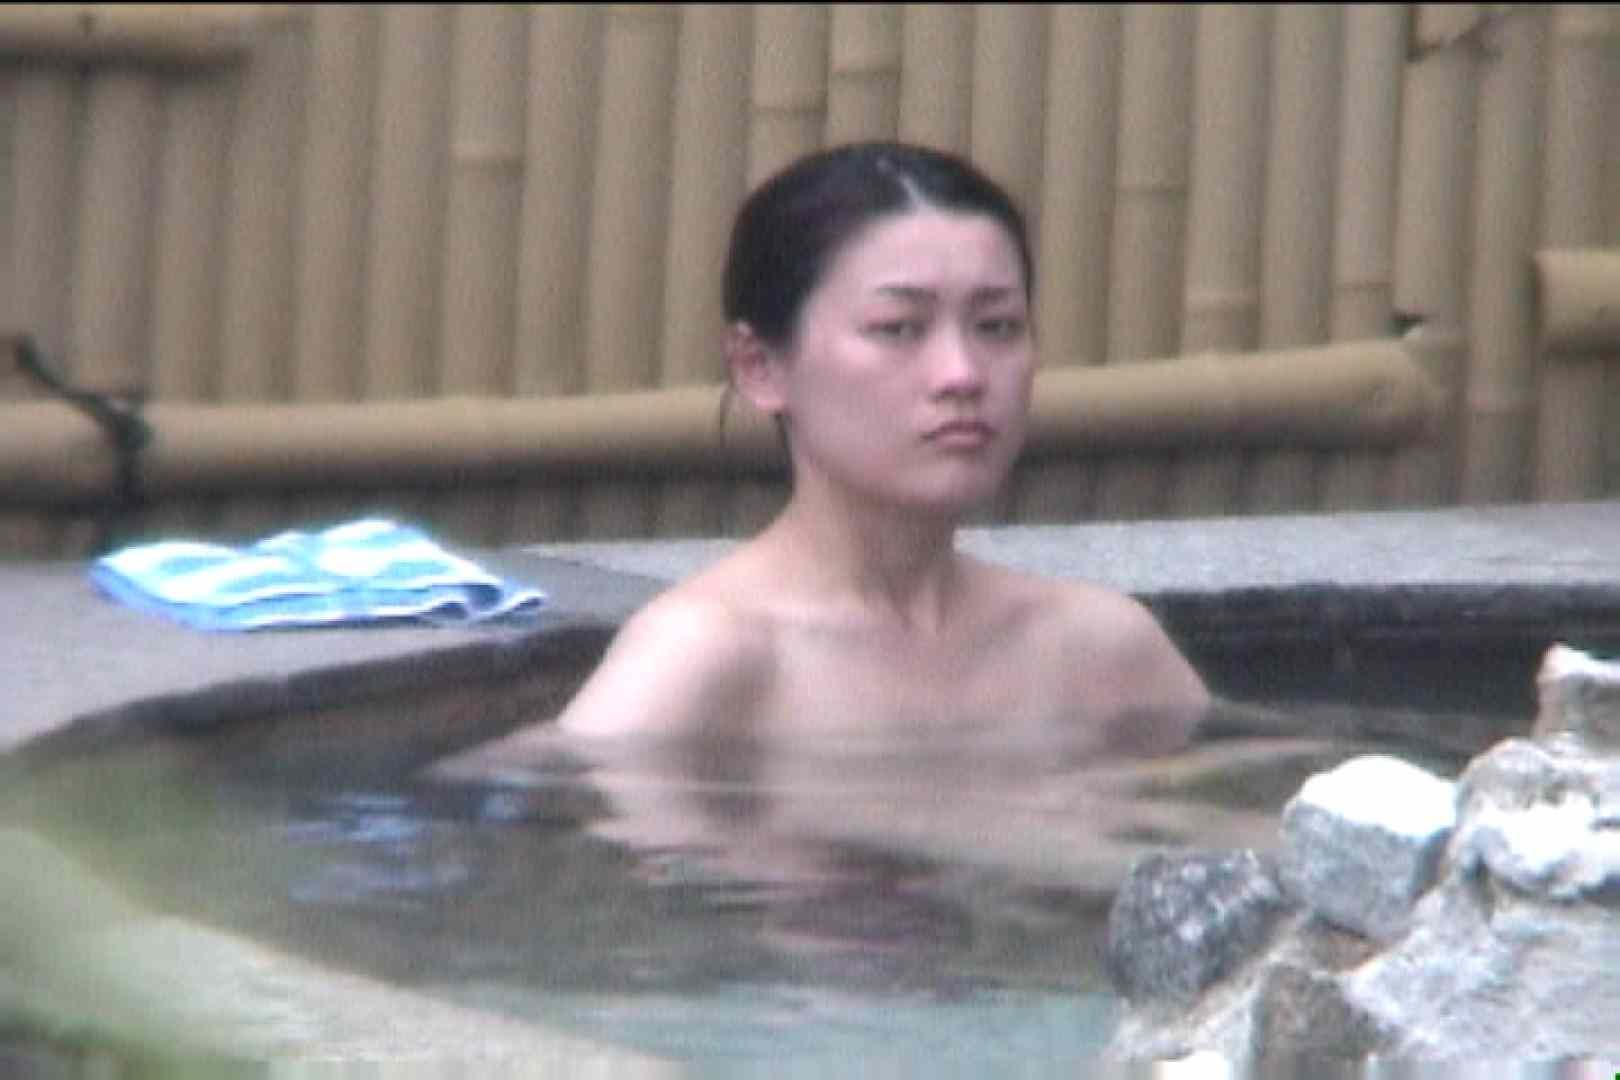 Aquaな露天風呂Vol.92【VIP限定】 盗撮 | OLのエロ生活  33連発 31